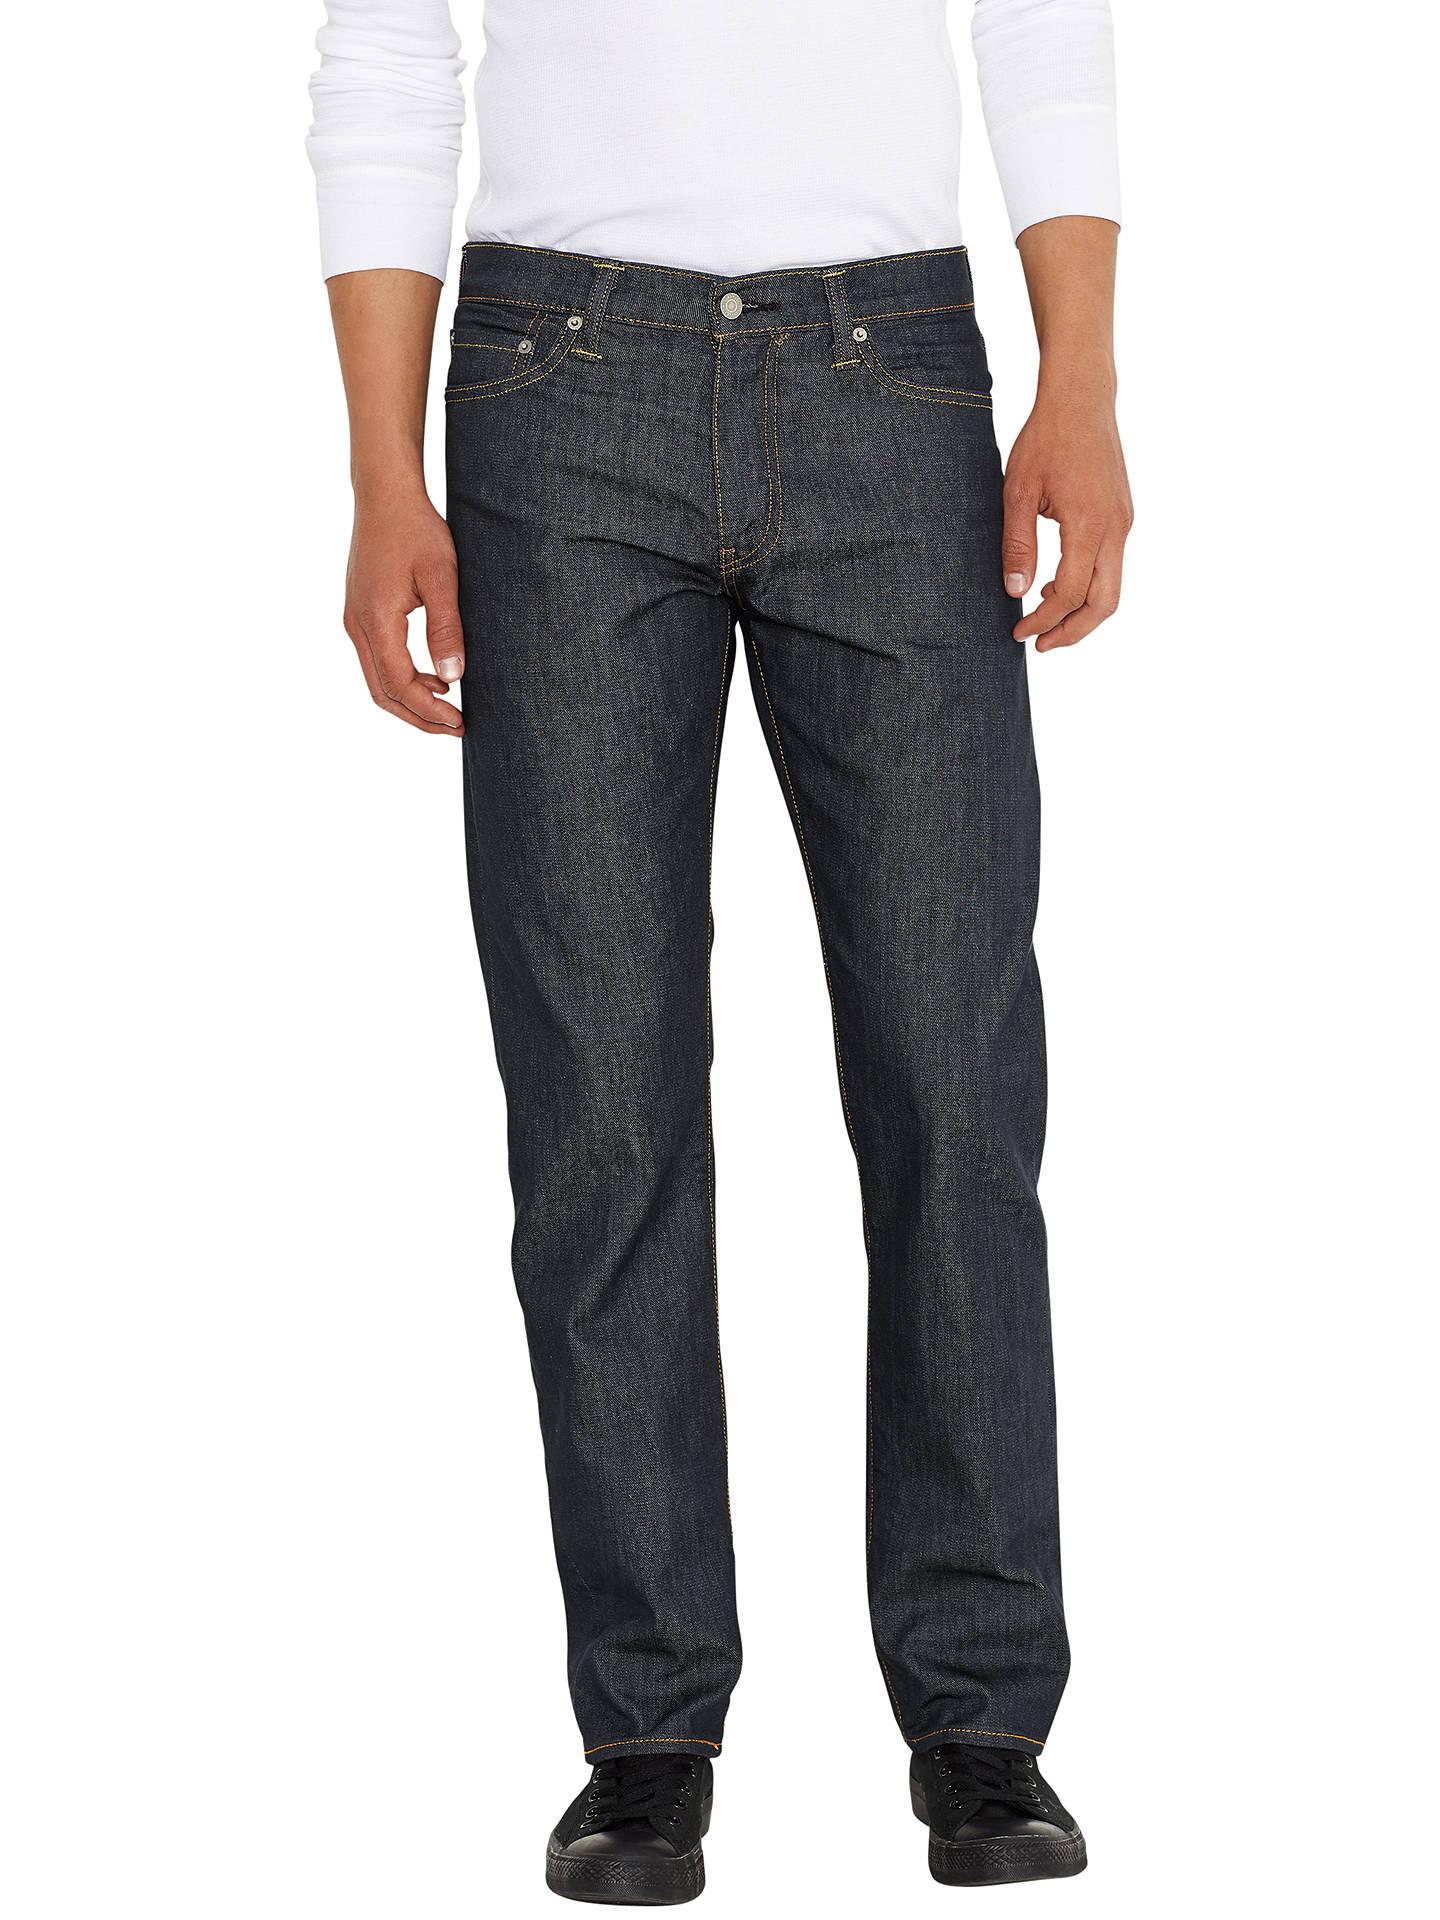 6ece38e5 Buy Levi's 504 Regular Straight Jeans, Hi Def, 30S Online at johnlewis. ...